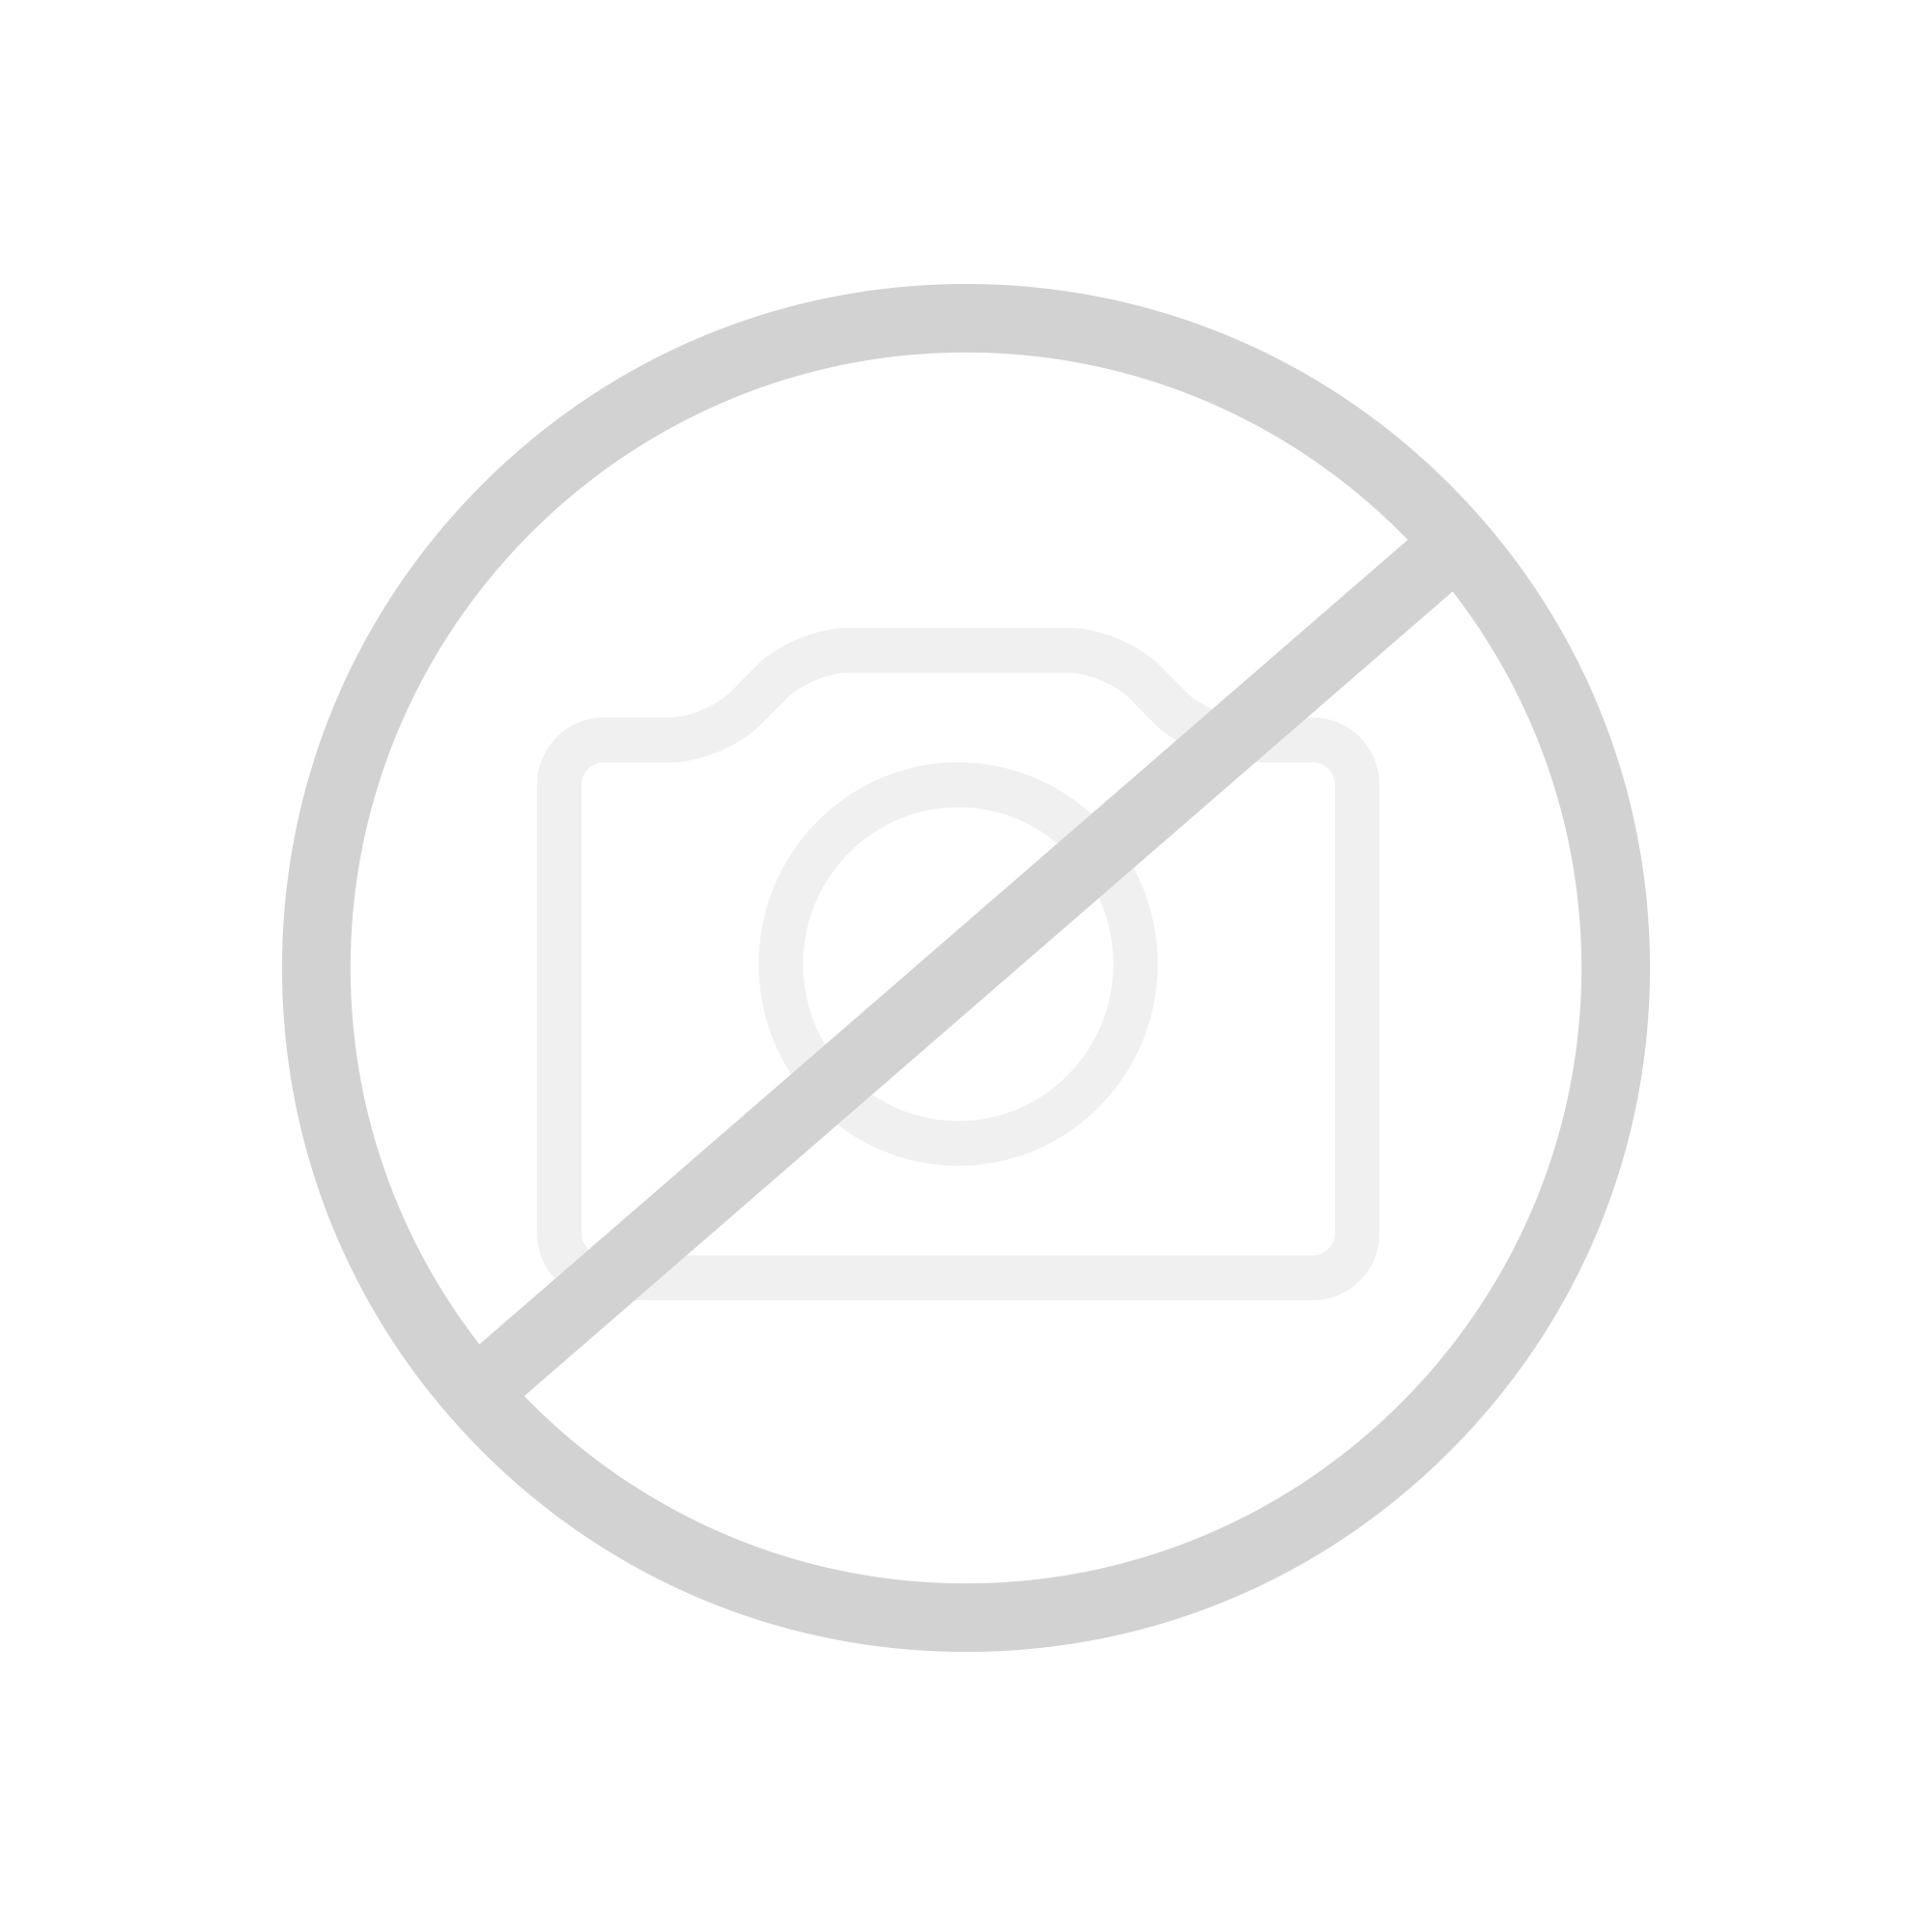 keramag myday tiefsp l wc l 54 b 36 cm wandh ngend ohne sp lrand wei 201460600 reuter. Black Bedroom Furniture Sets. Home Design Ideas